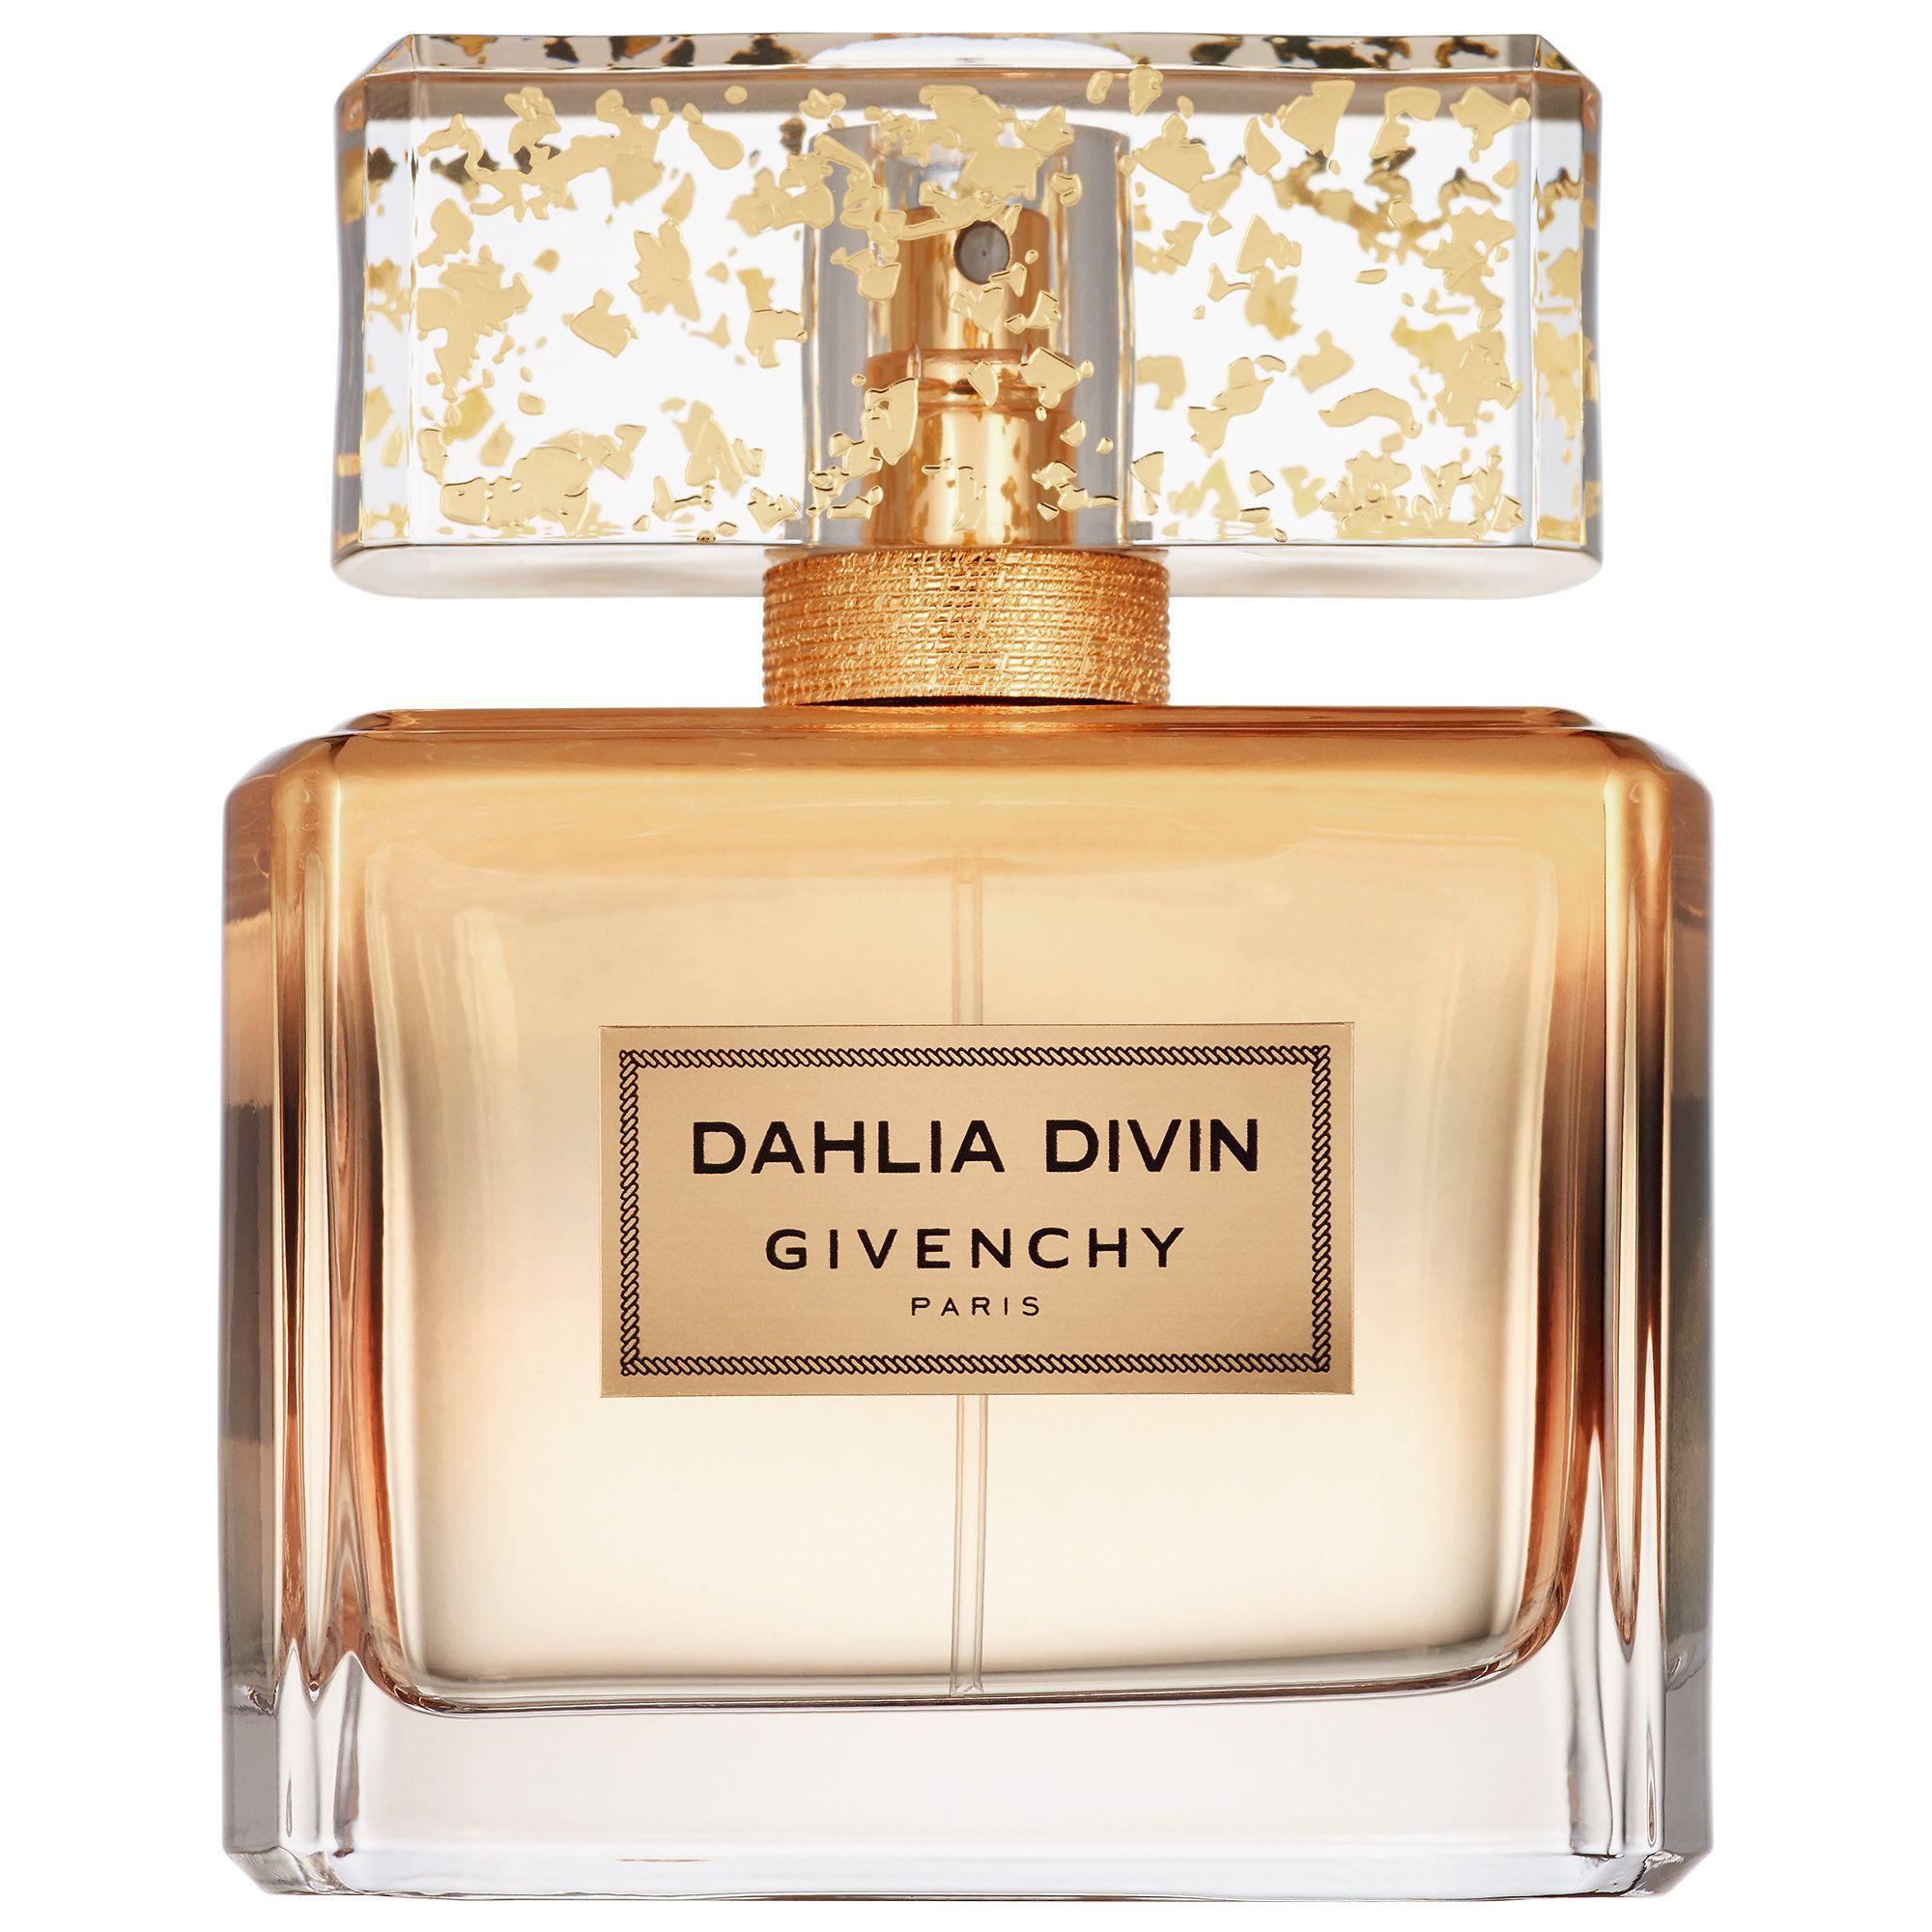 Shop Dahlia Divin Le Nectar De Parfum By Givenchy At Sephora This